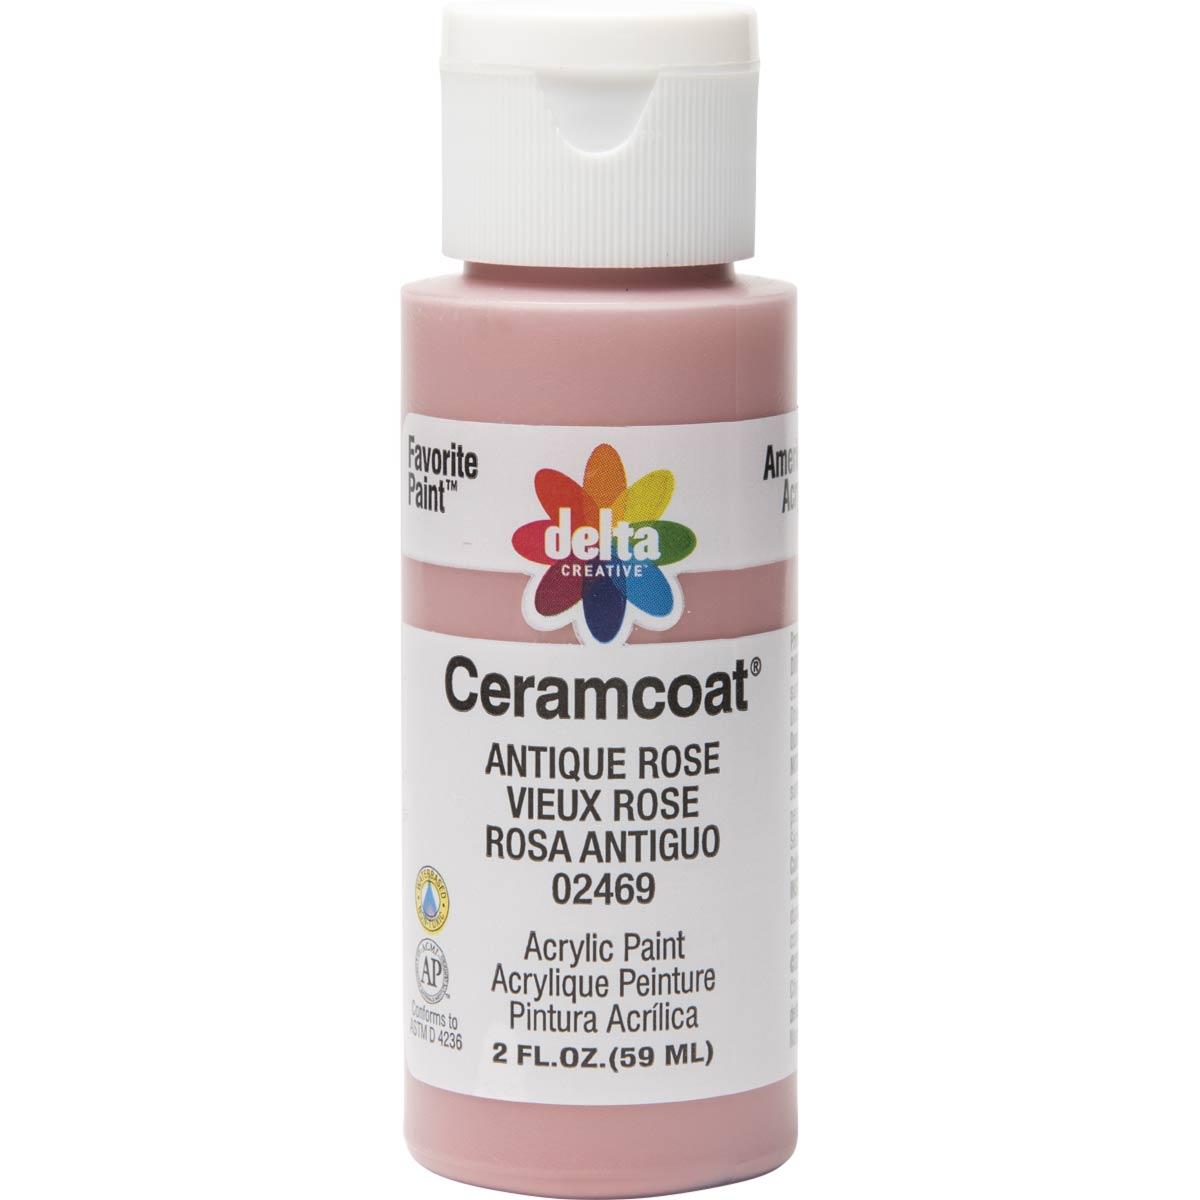 Delta Ceramcoat ® Acrylic Paint - Antique Rose, 2 oz. - 024690202W